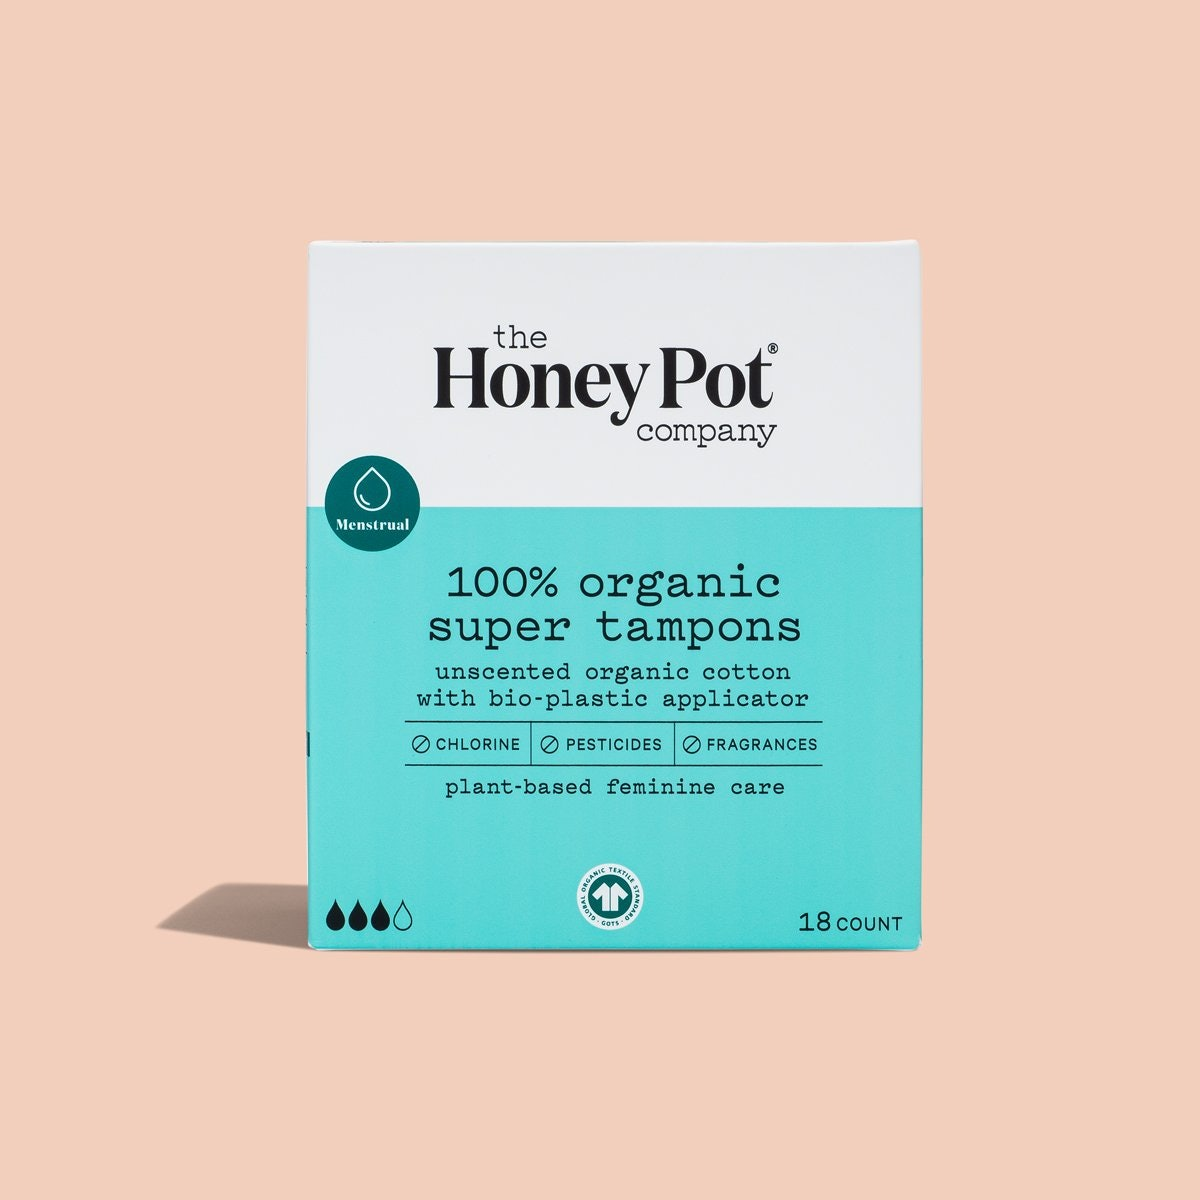 The Honey Pot 100% Organic Super Tampons